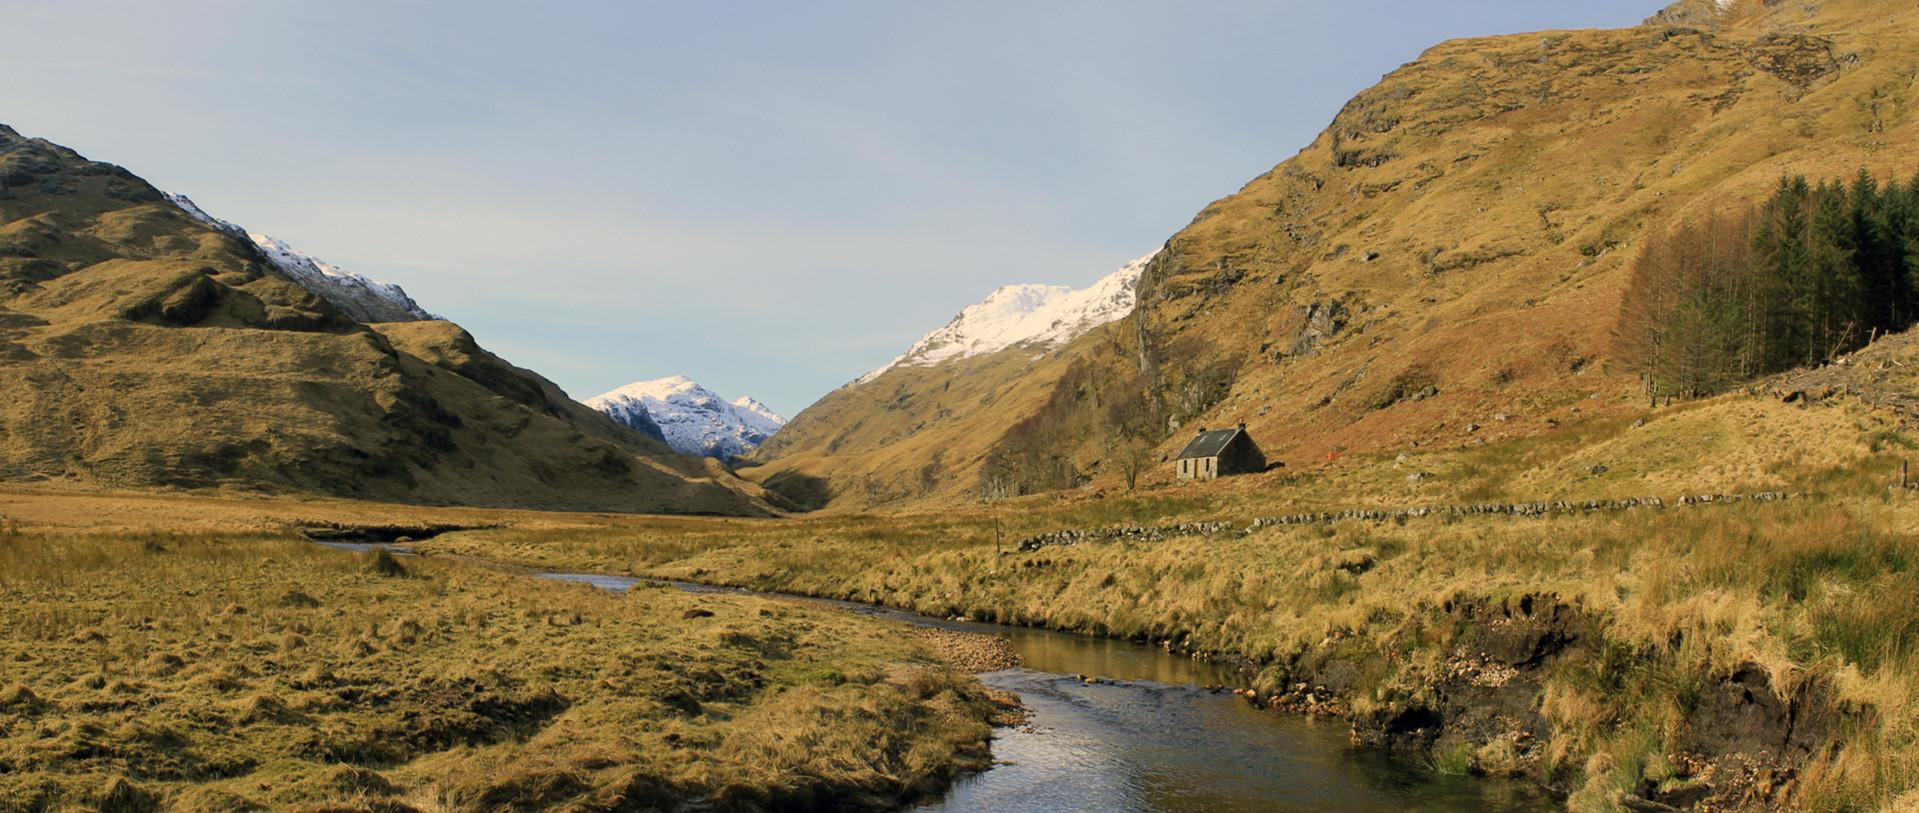 Glen Pean Bothy, Western Highlands